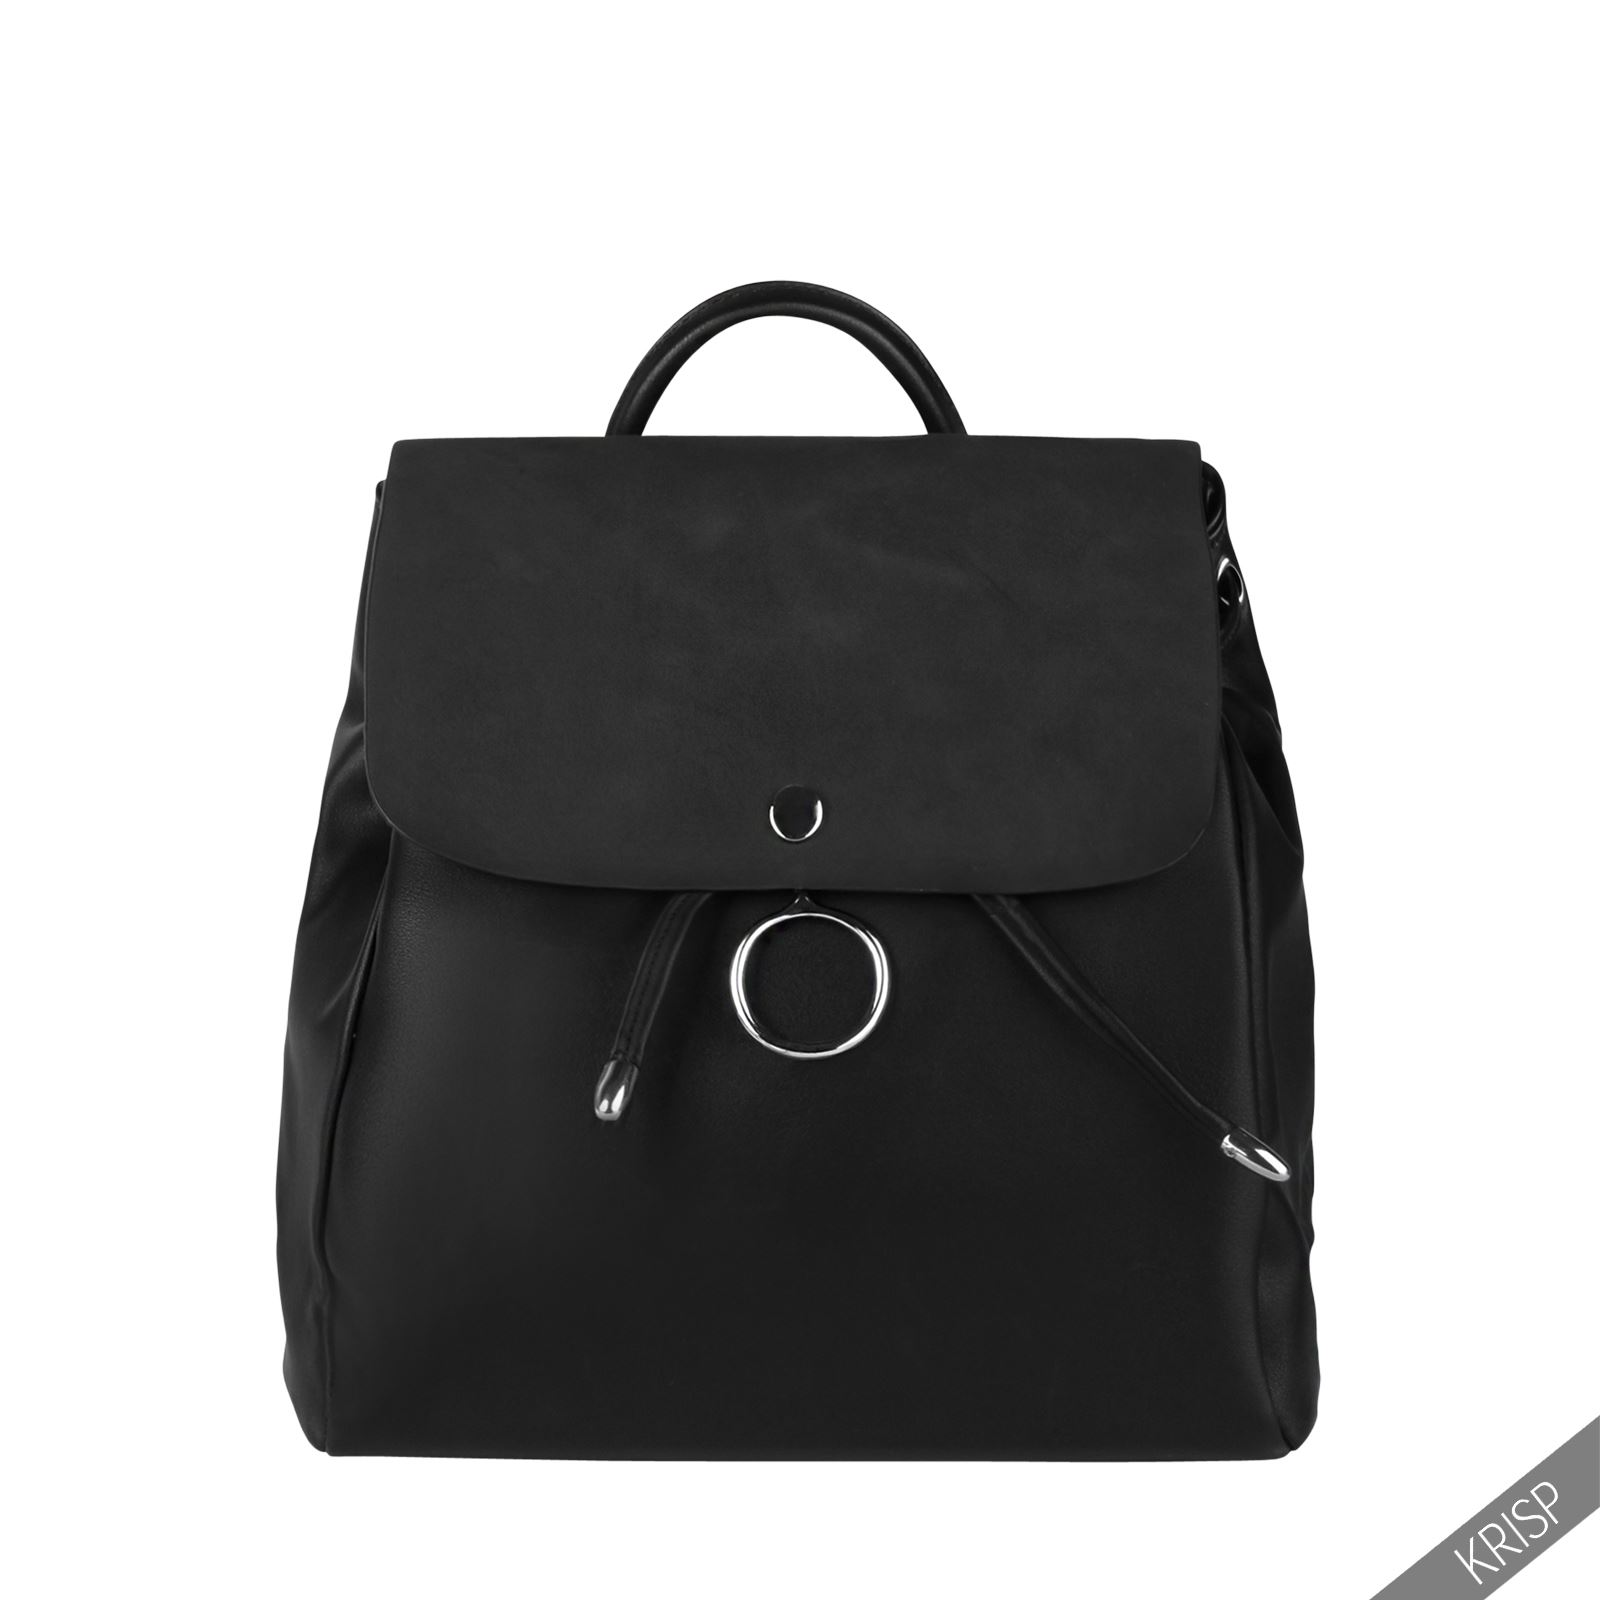 Krisp mochila negra bolso vestir elegante joven juvenil for Mochila oficina